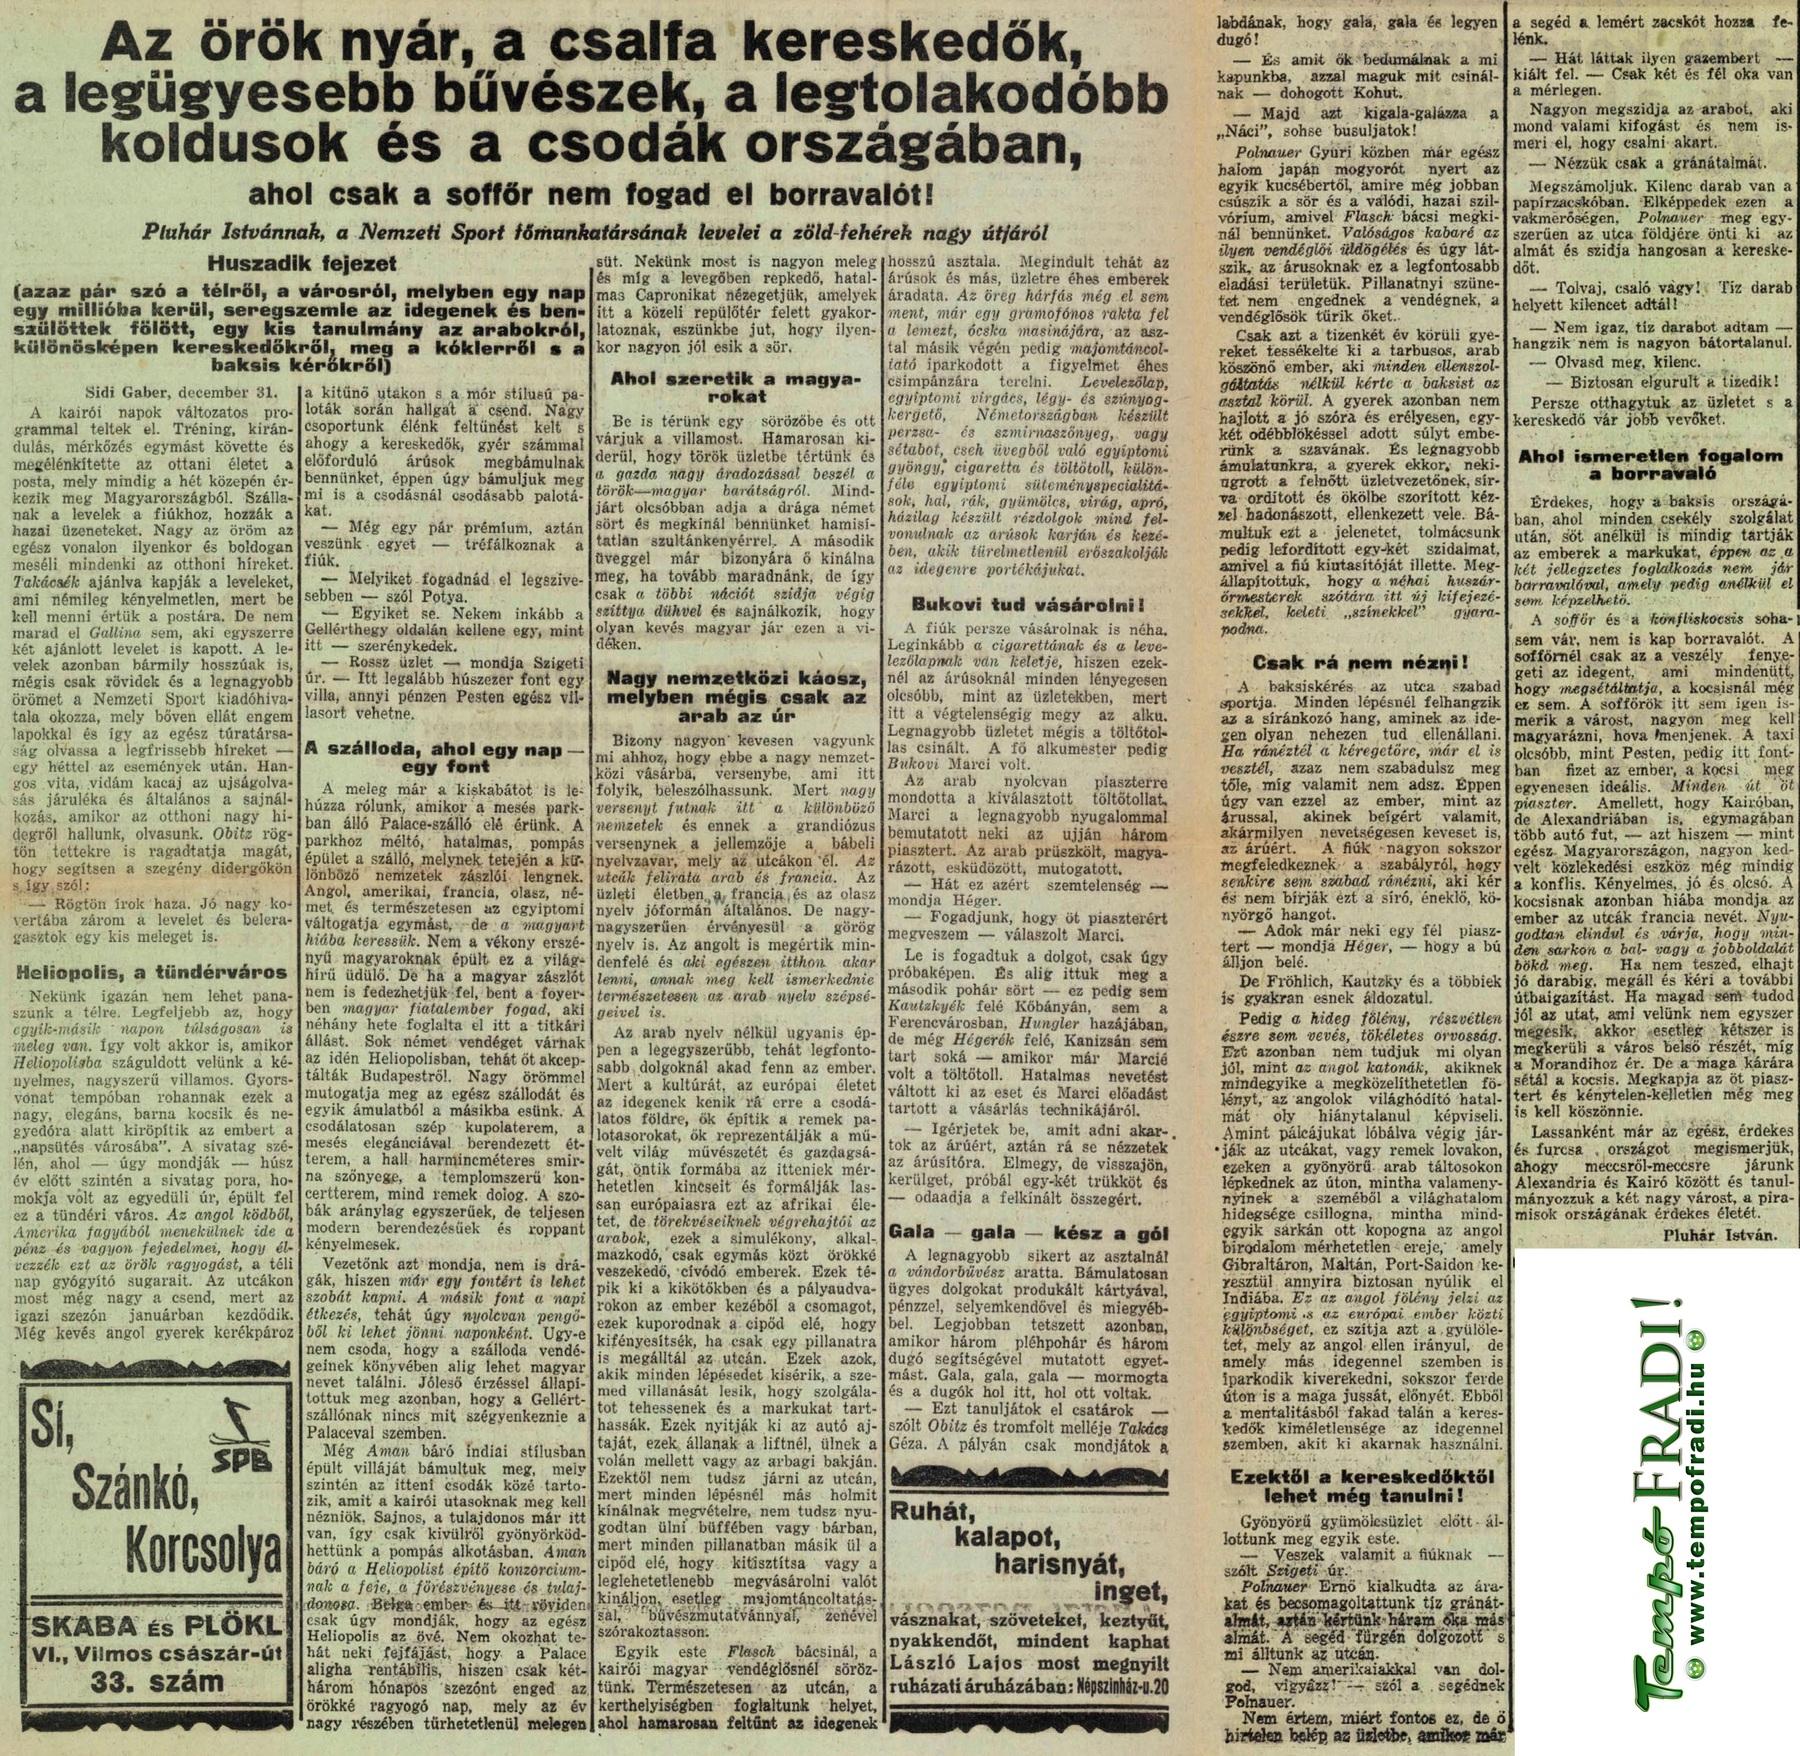 NS-19280115-0304-192712